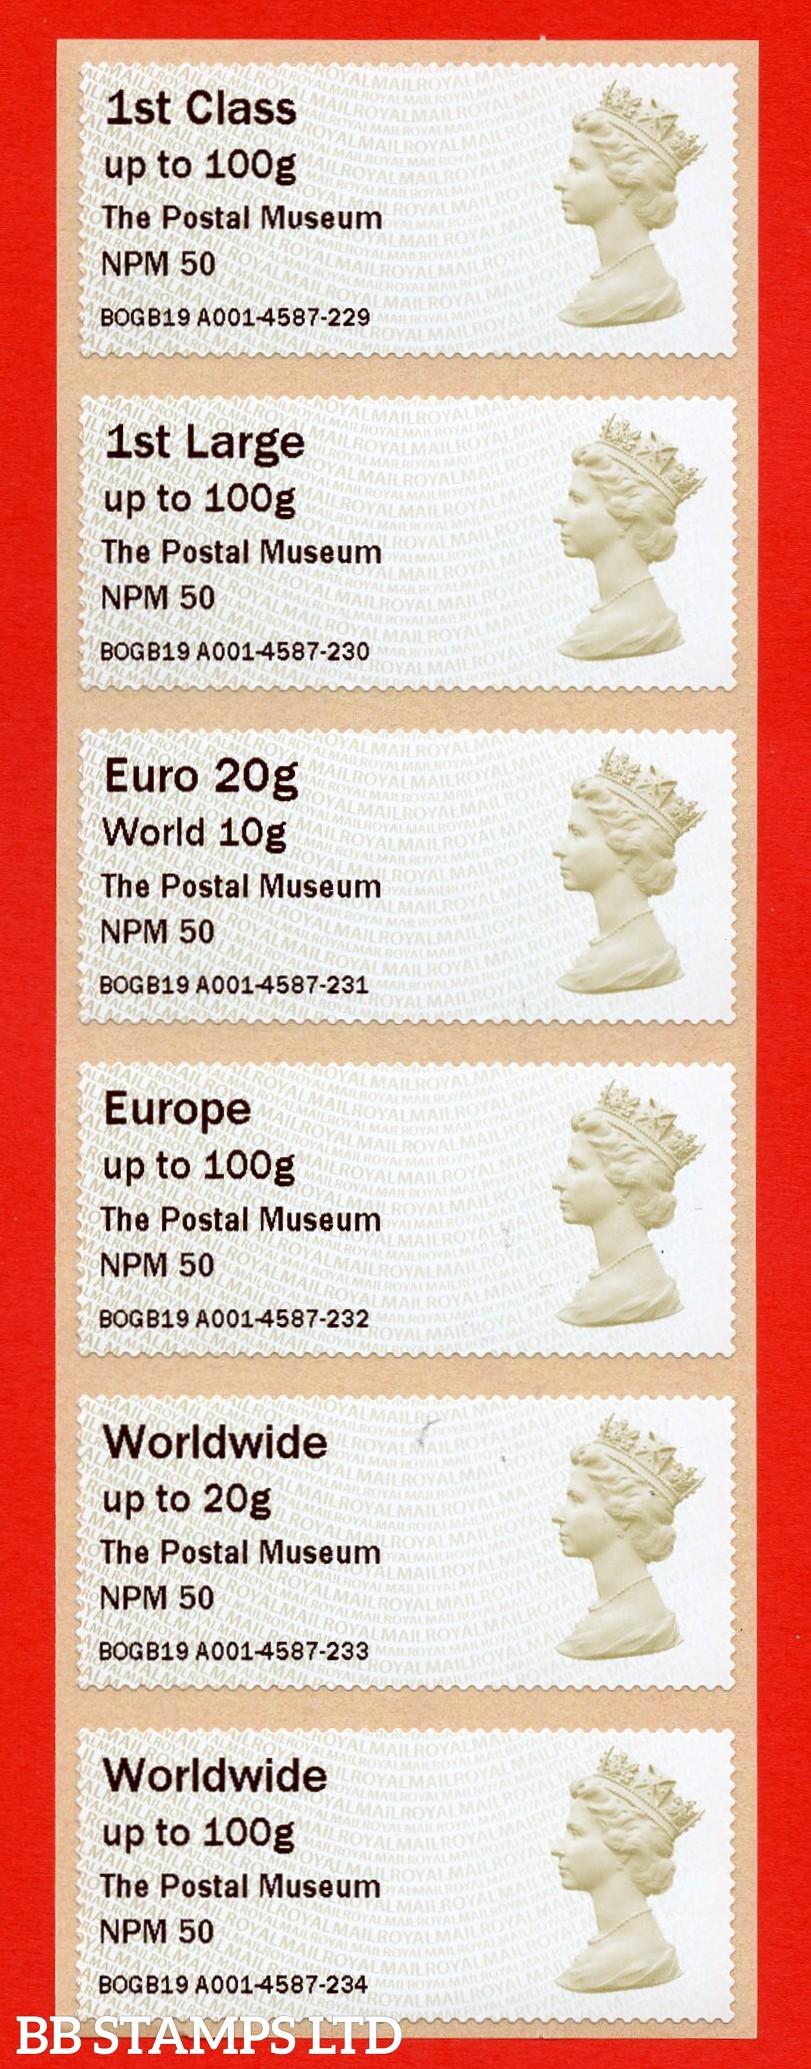 Machin The Postal Museum NPM 50: 1st - W/Wide 100g: MA15 Type IIIA (set of 6) (BK29,P14)